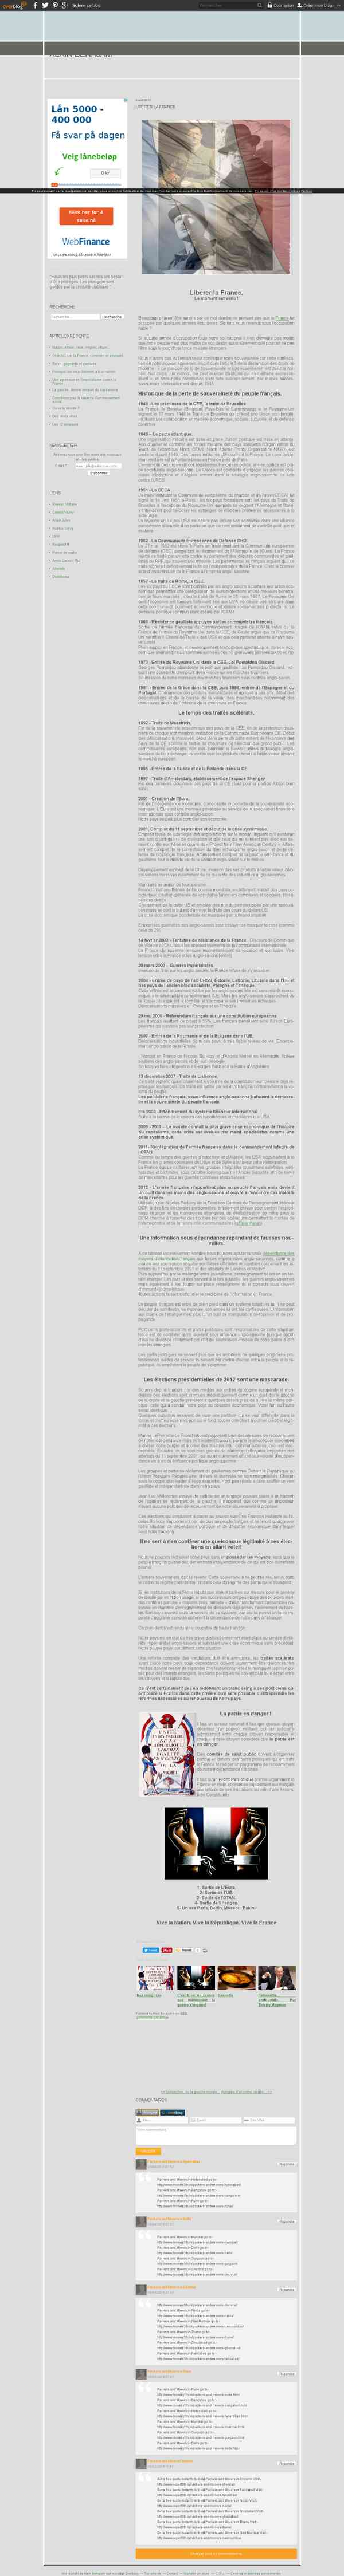 alain-benajam.com/article-liberer-la-france-103113956.html